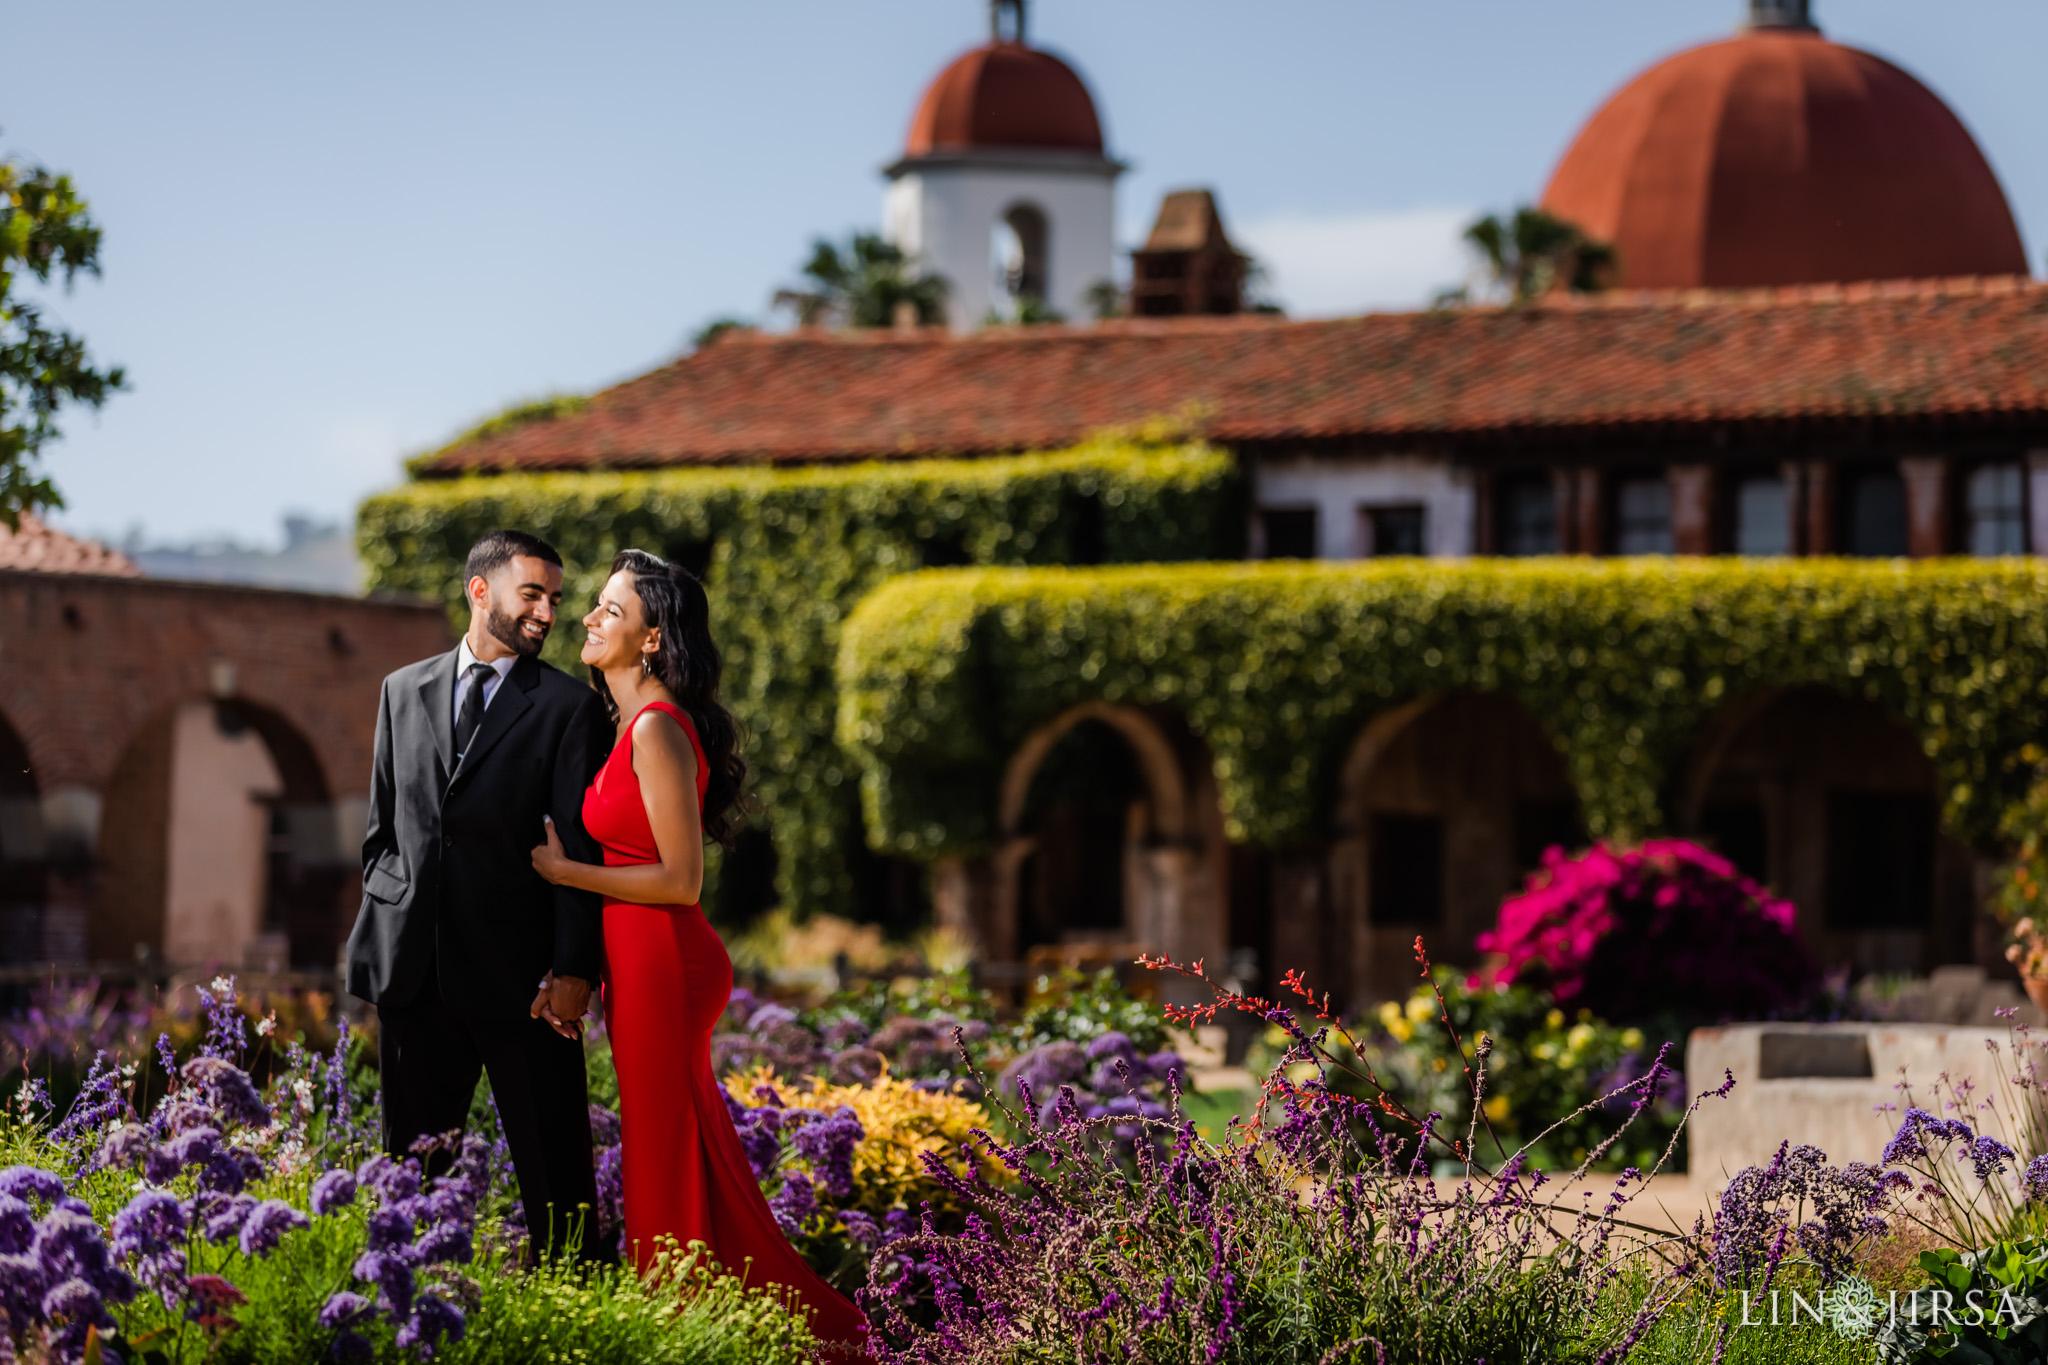 zbf Mission San Juan Capistrano Engagement Photography